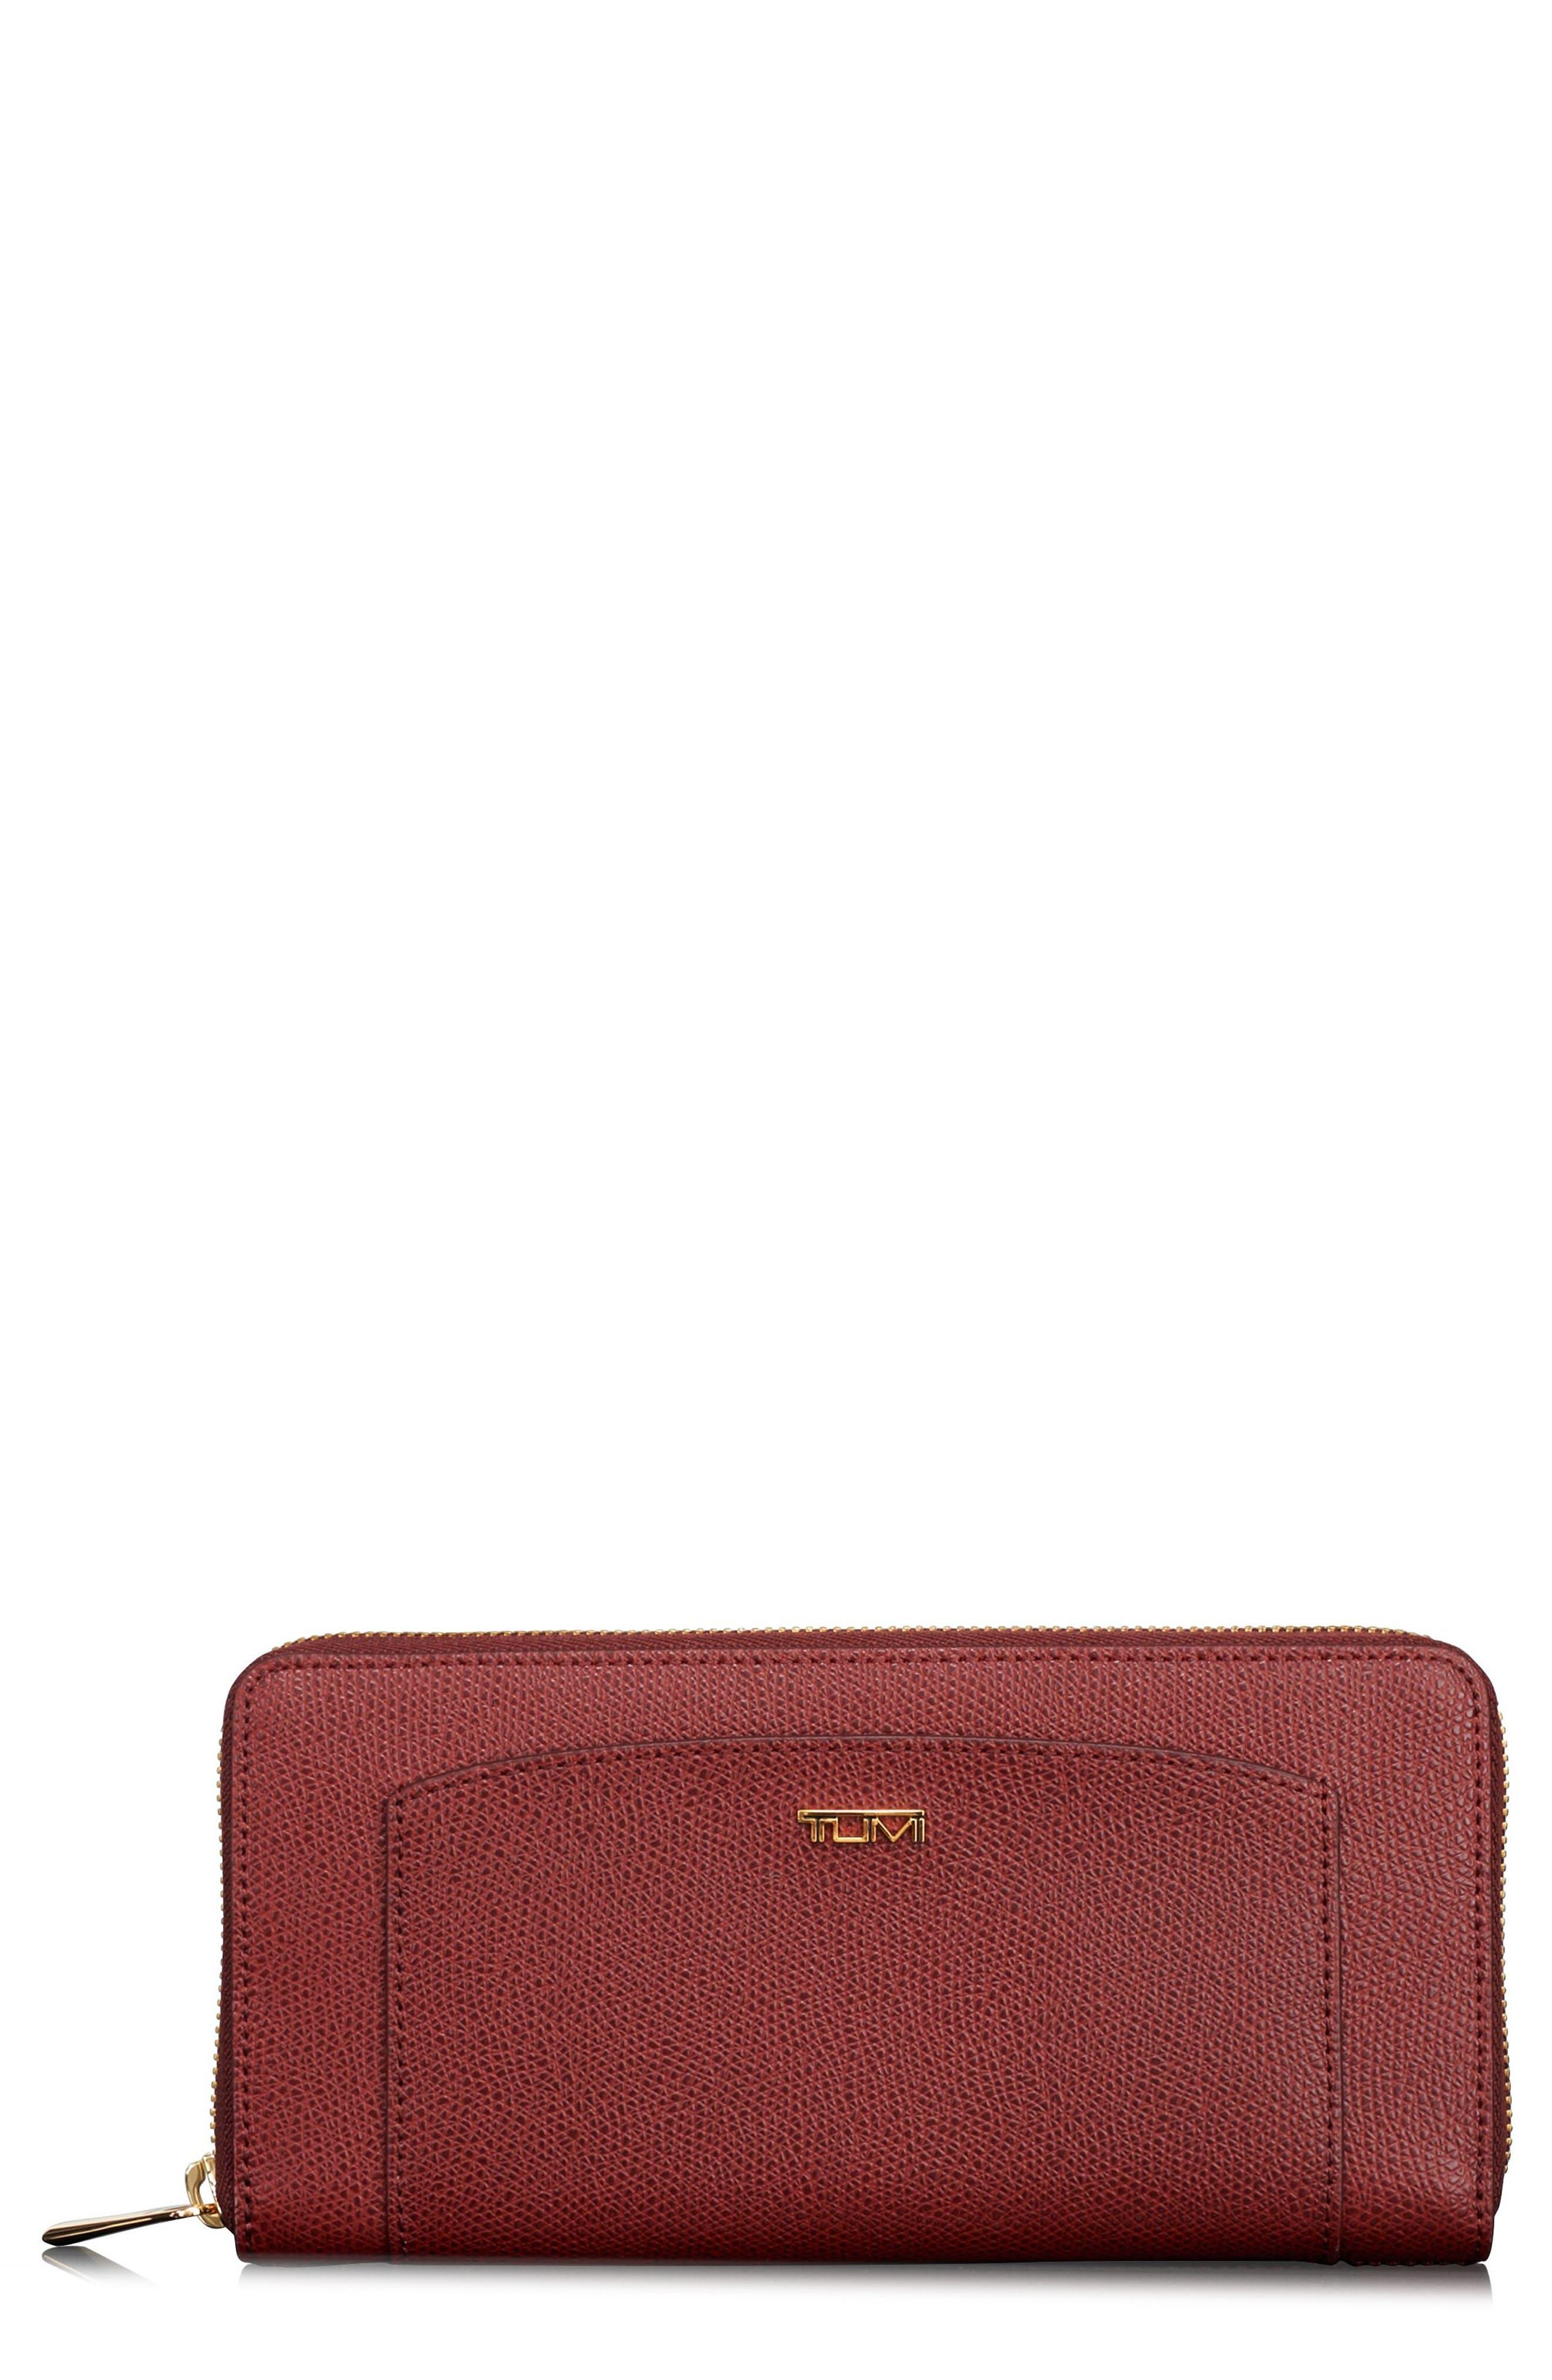 Continental Tech Wallet,                         Main,                         color, Burgundy